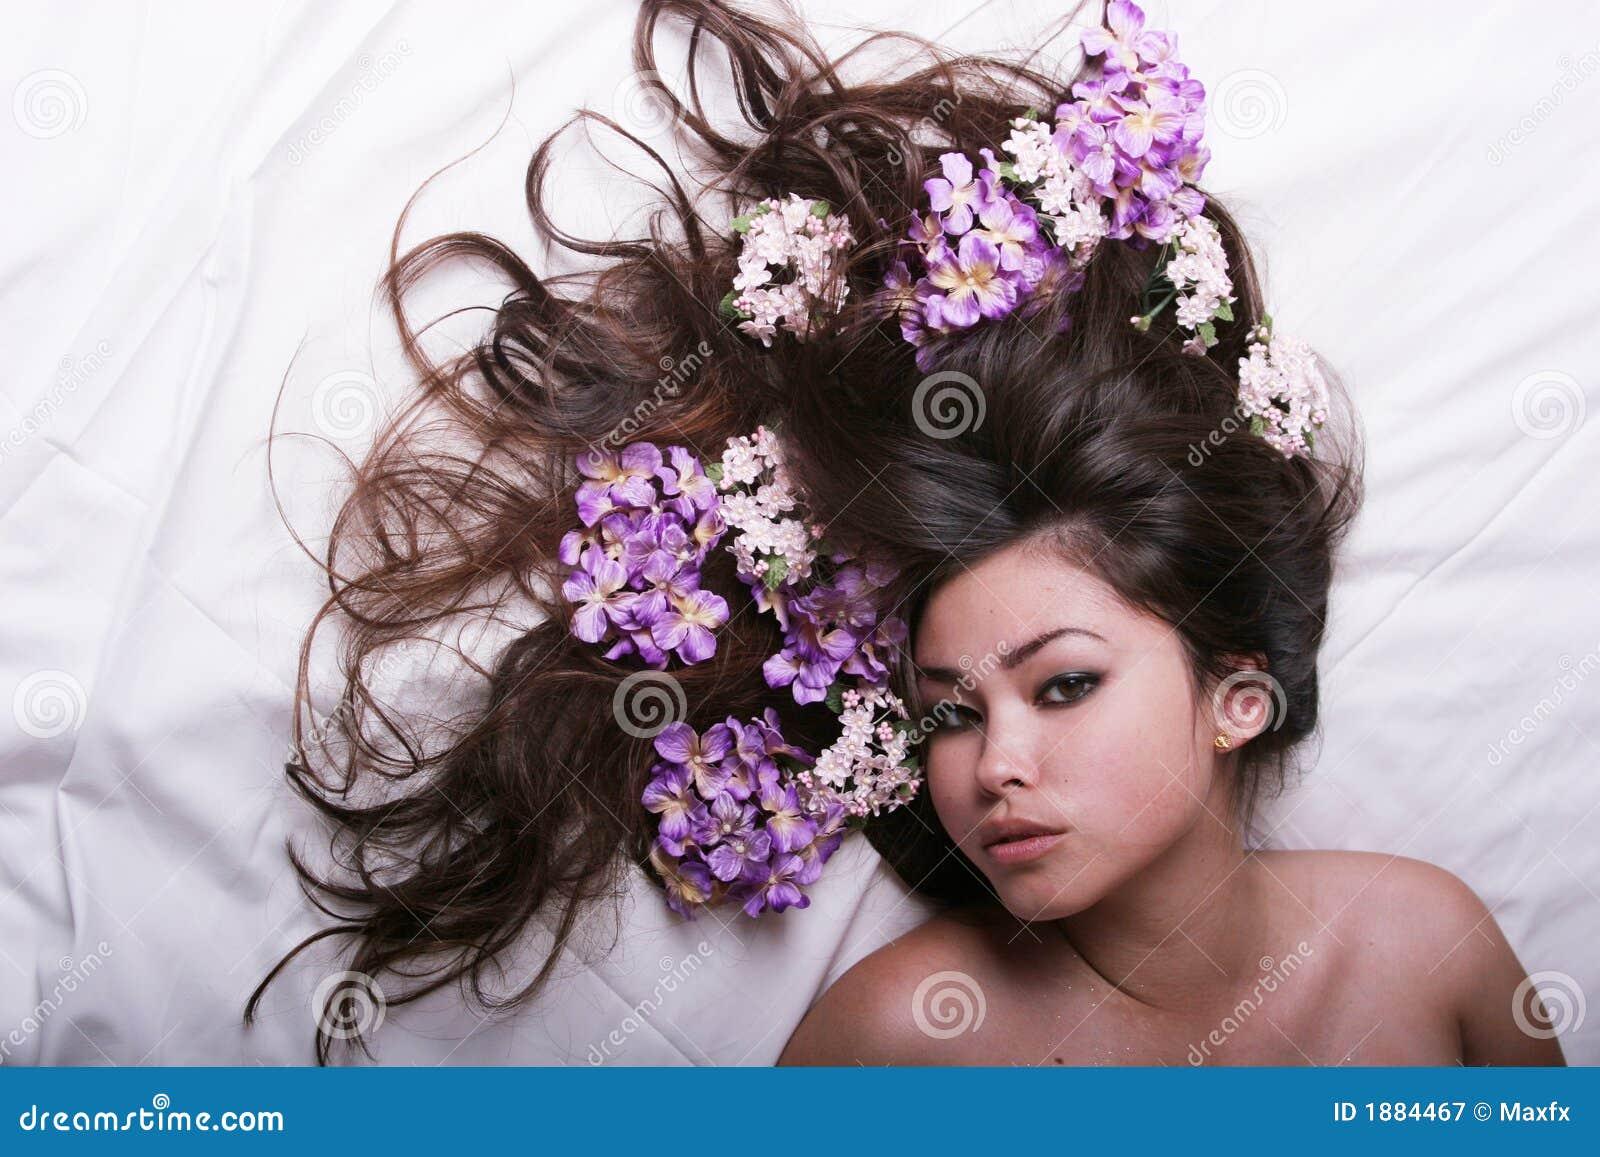 erotical massage asian flowers massage